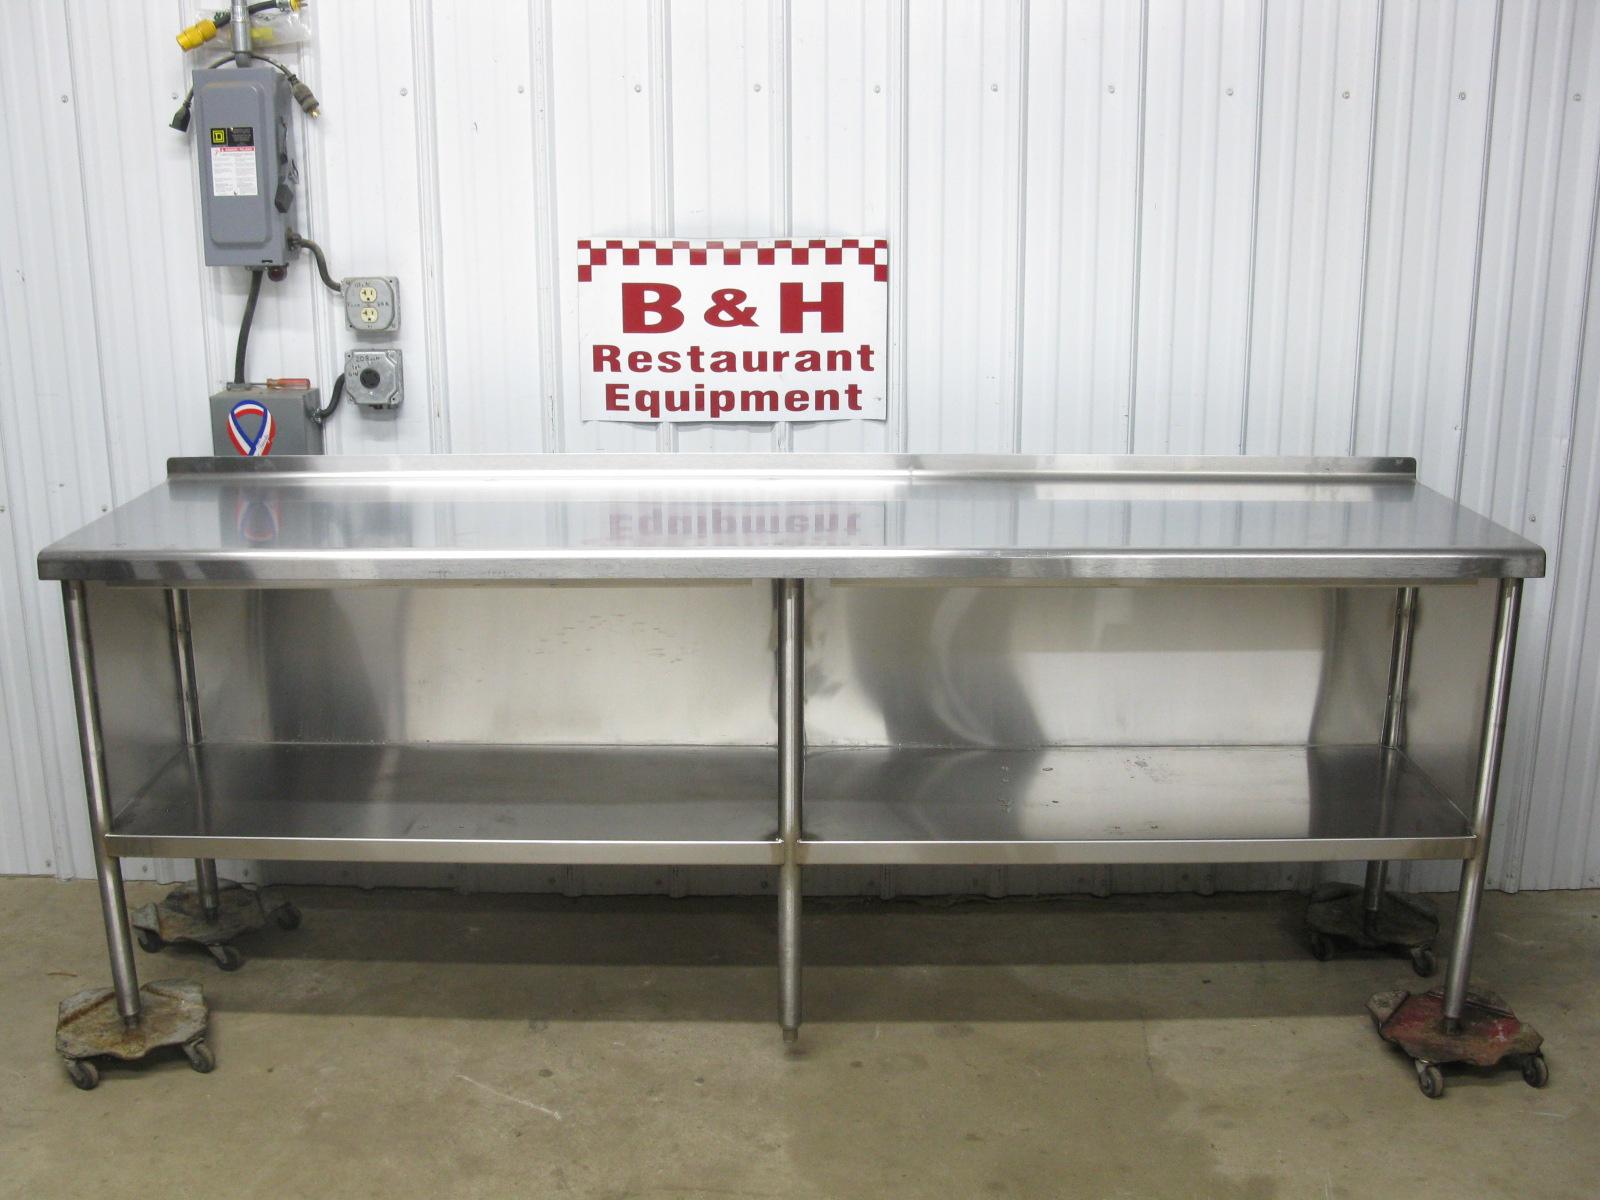 96 X 24 Stainless Steel Heavy Duty Kitchen Cabinet Work Prep Table 8 X 2 B H Restaurant Equipment